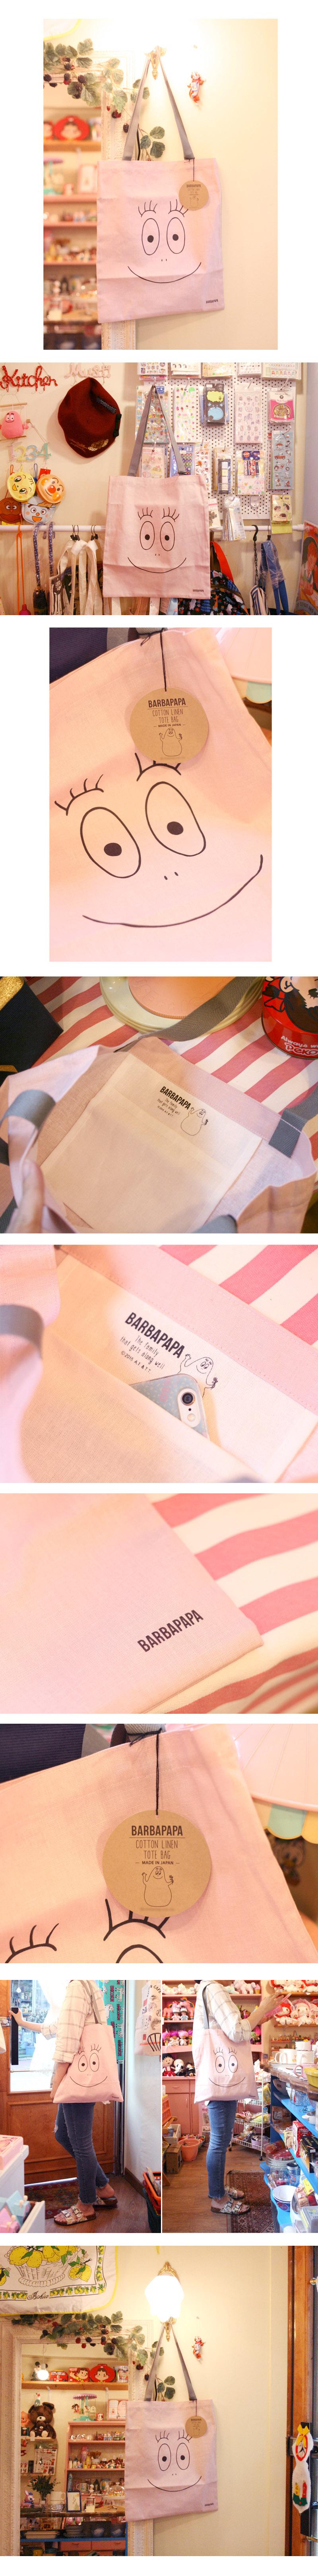 Barbapapa 바바파파 핑크 에코백27,000원-디저트신드롬패션잡화, 가방, 캔버스/에코백, 에코백바보사랑Barbapapa 바바파파 핑크 에코백27,000원-디저트신드롬패션잡화, 가방, 캔버스/에코백, 에코백바보사랑